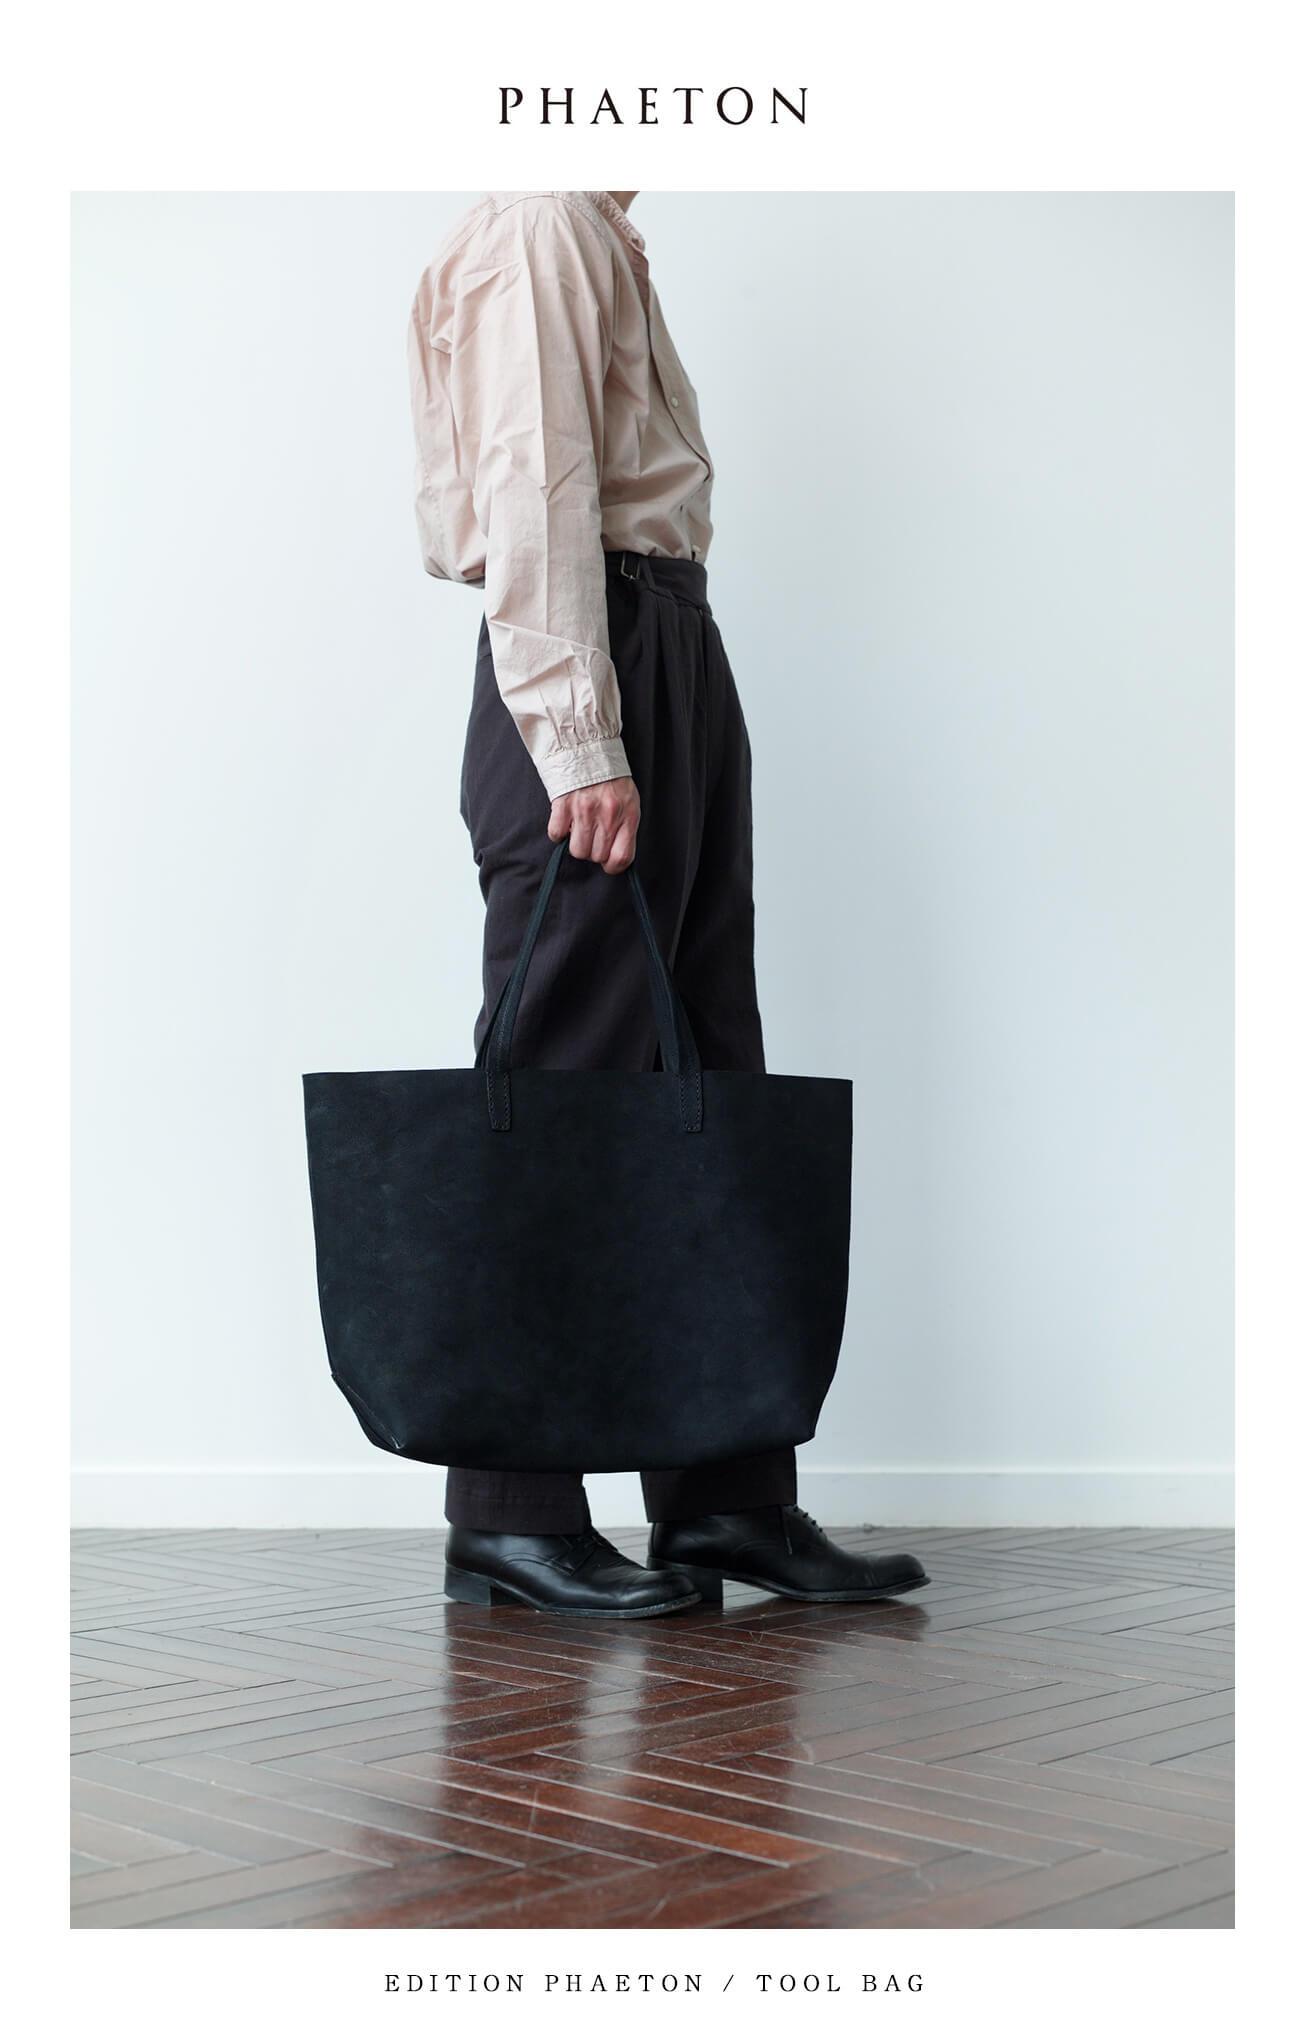 editionphaeton-toolbag01